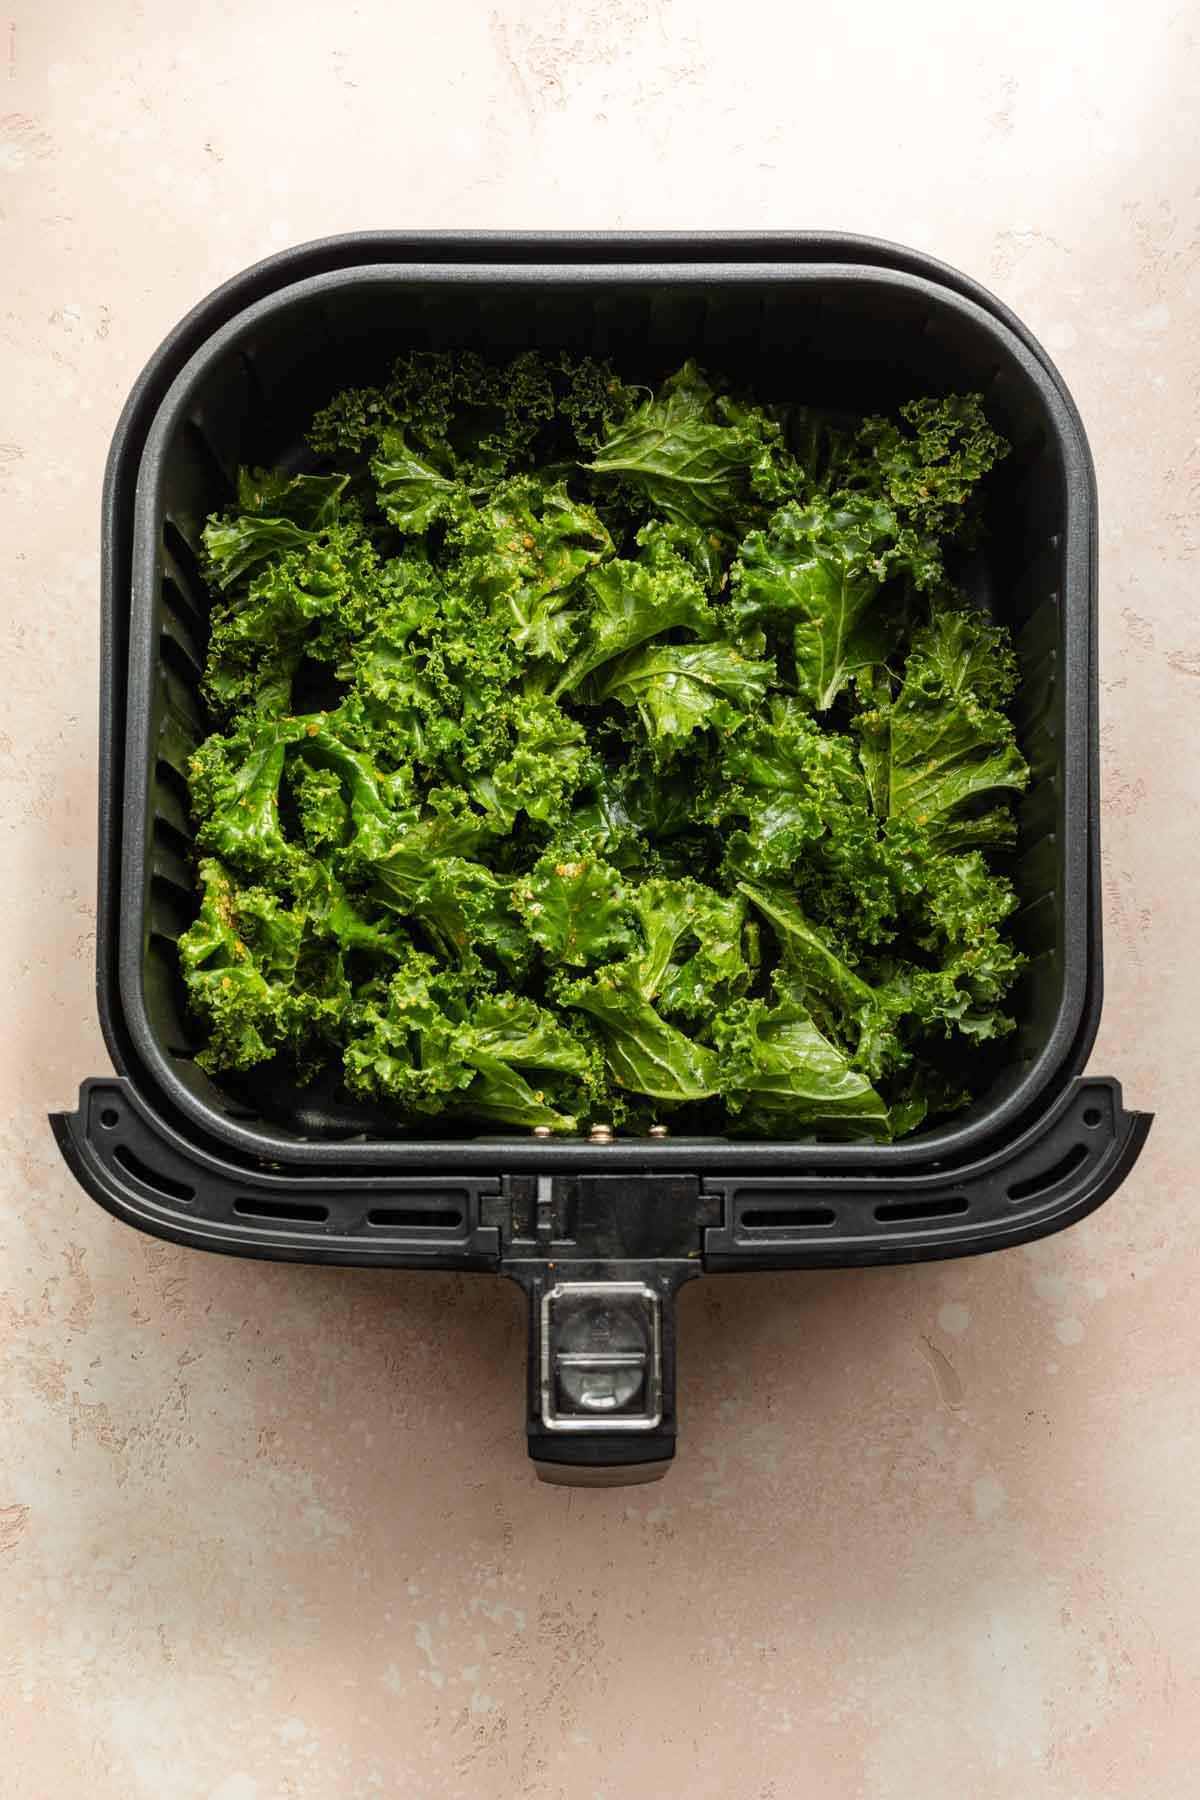 Overhead view of seasoned kale pieces in an air fryer basket.